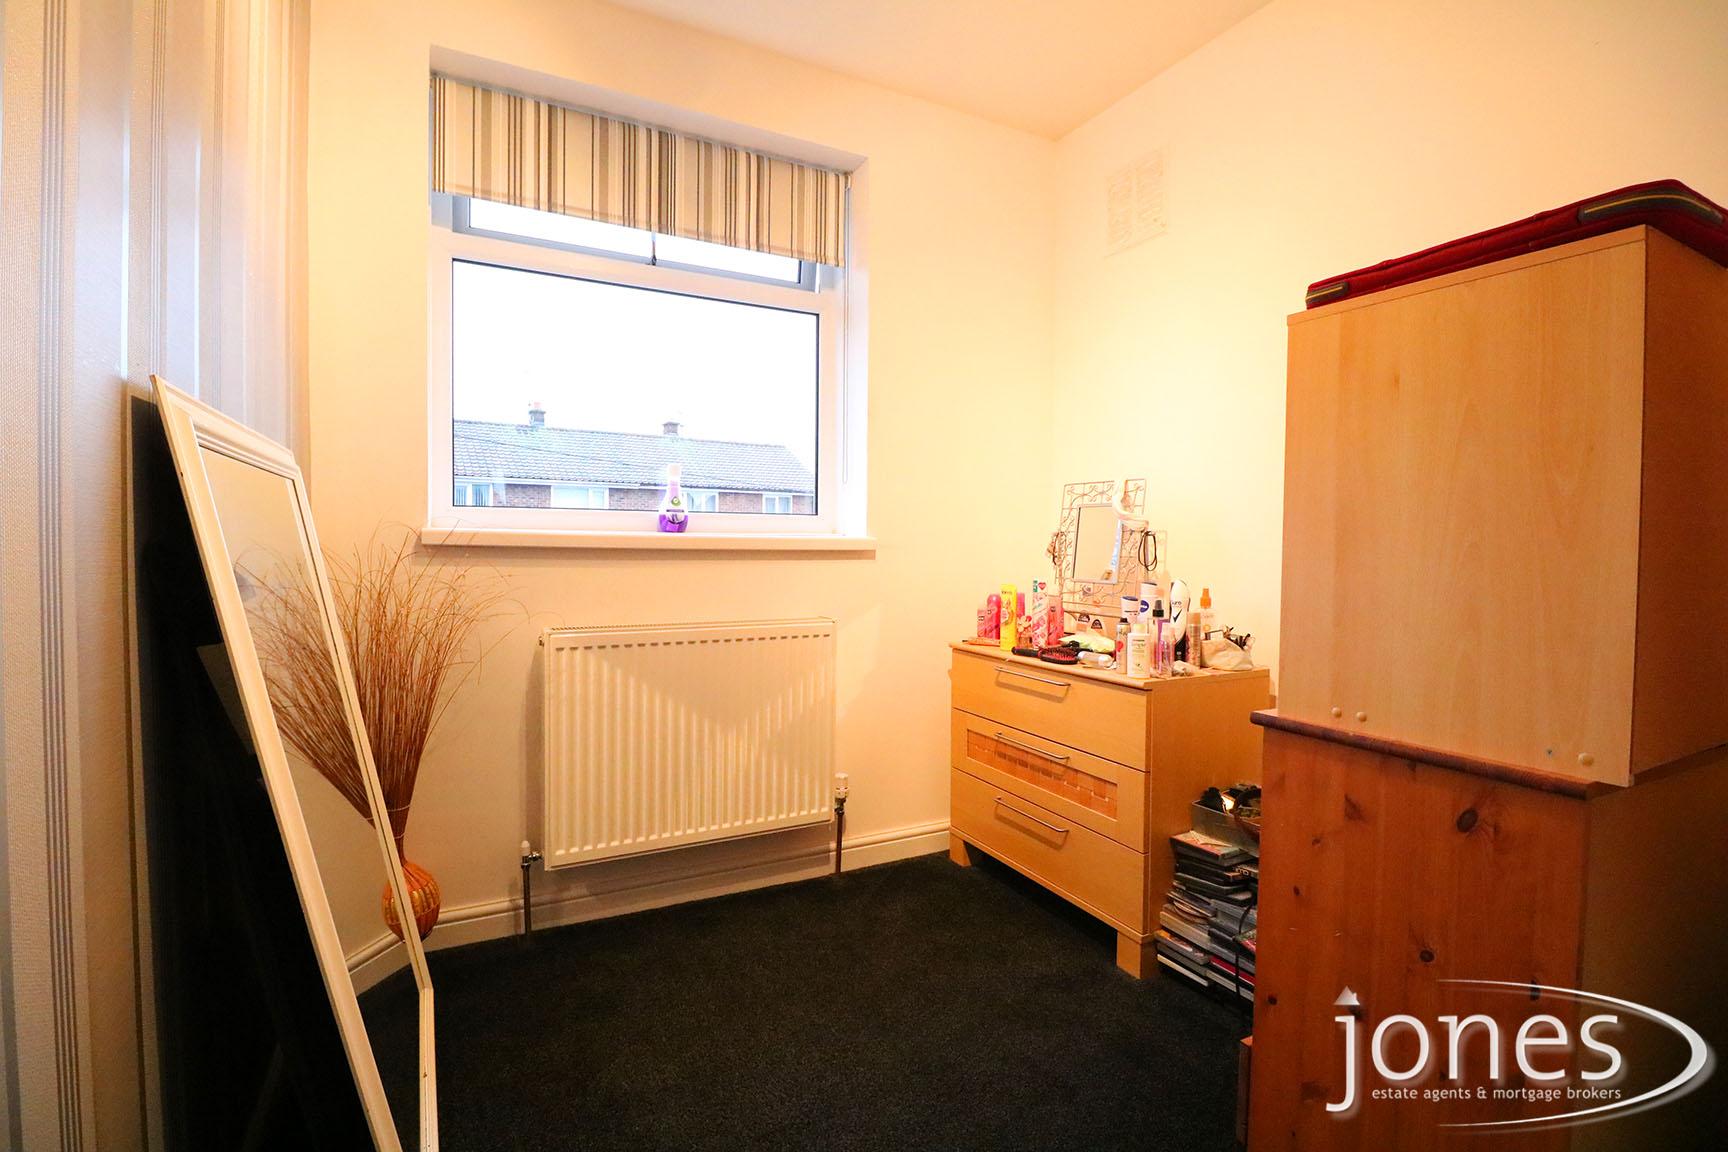 Home for Sale Let - Photo 09 Feetham Avenue, Darlington, DL1 2DY